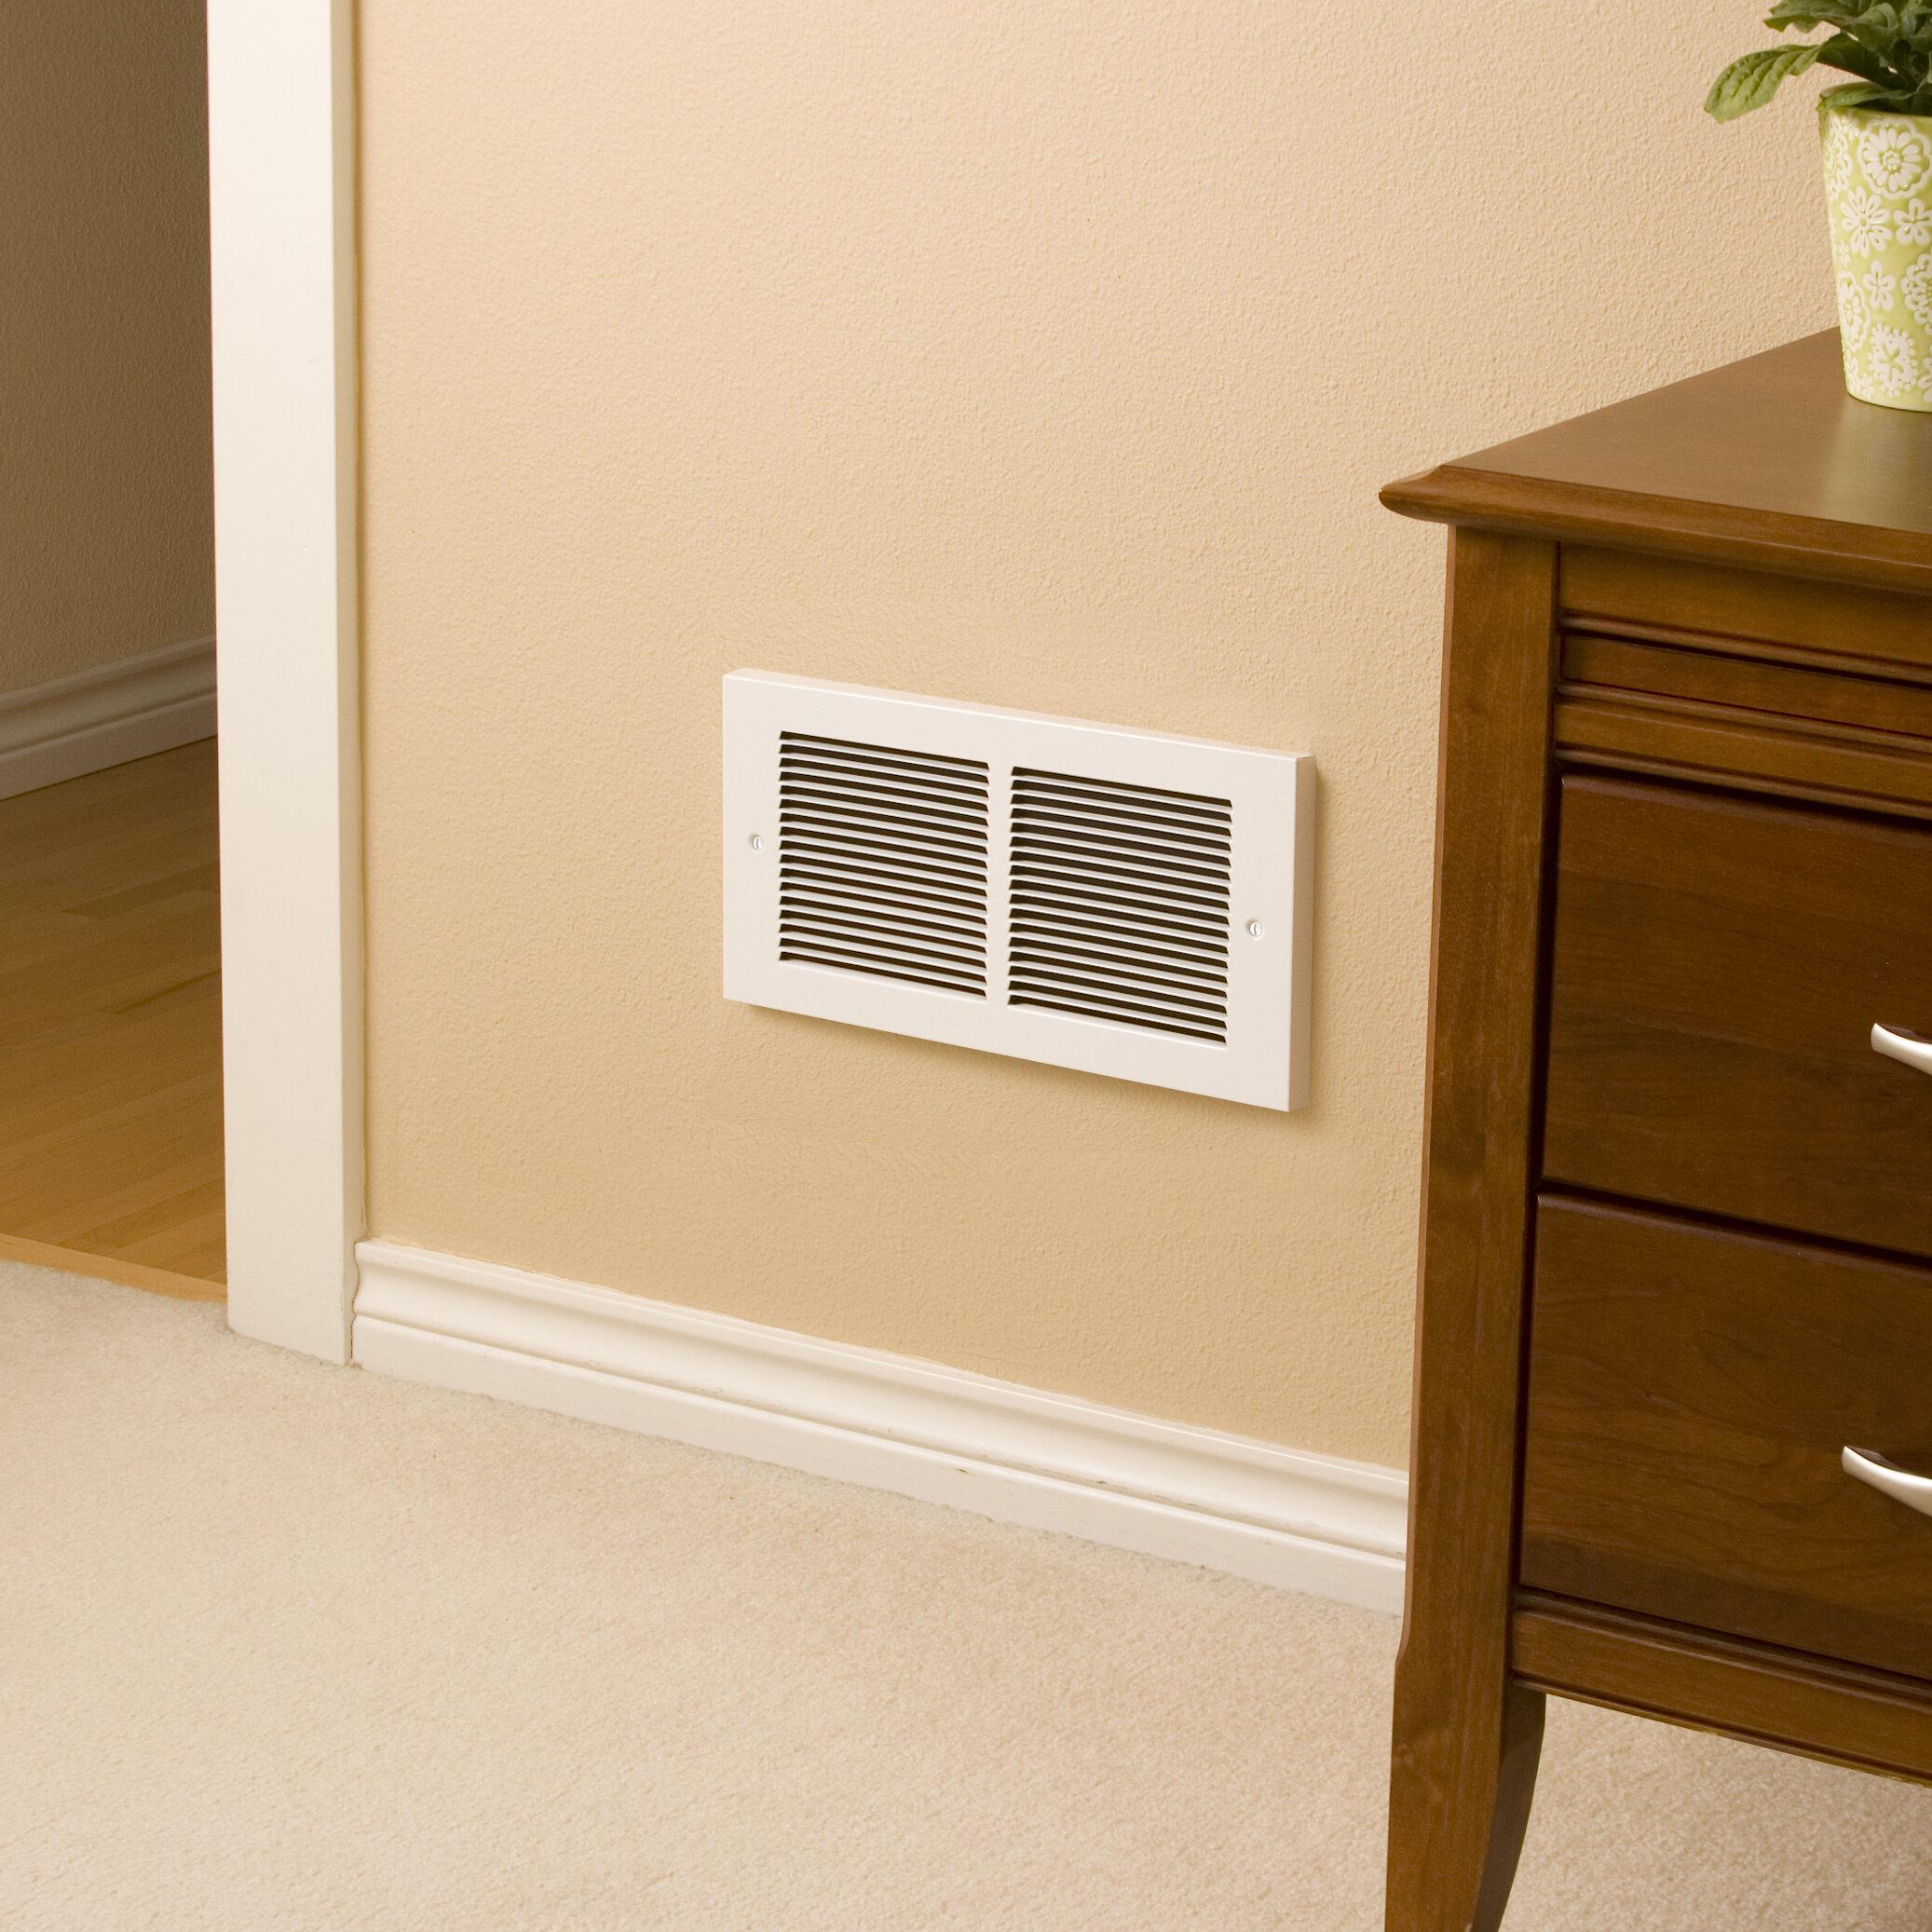 Cadet Register Series Electric Fan Wall Insert Heater & Reviews ...